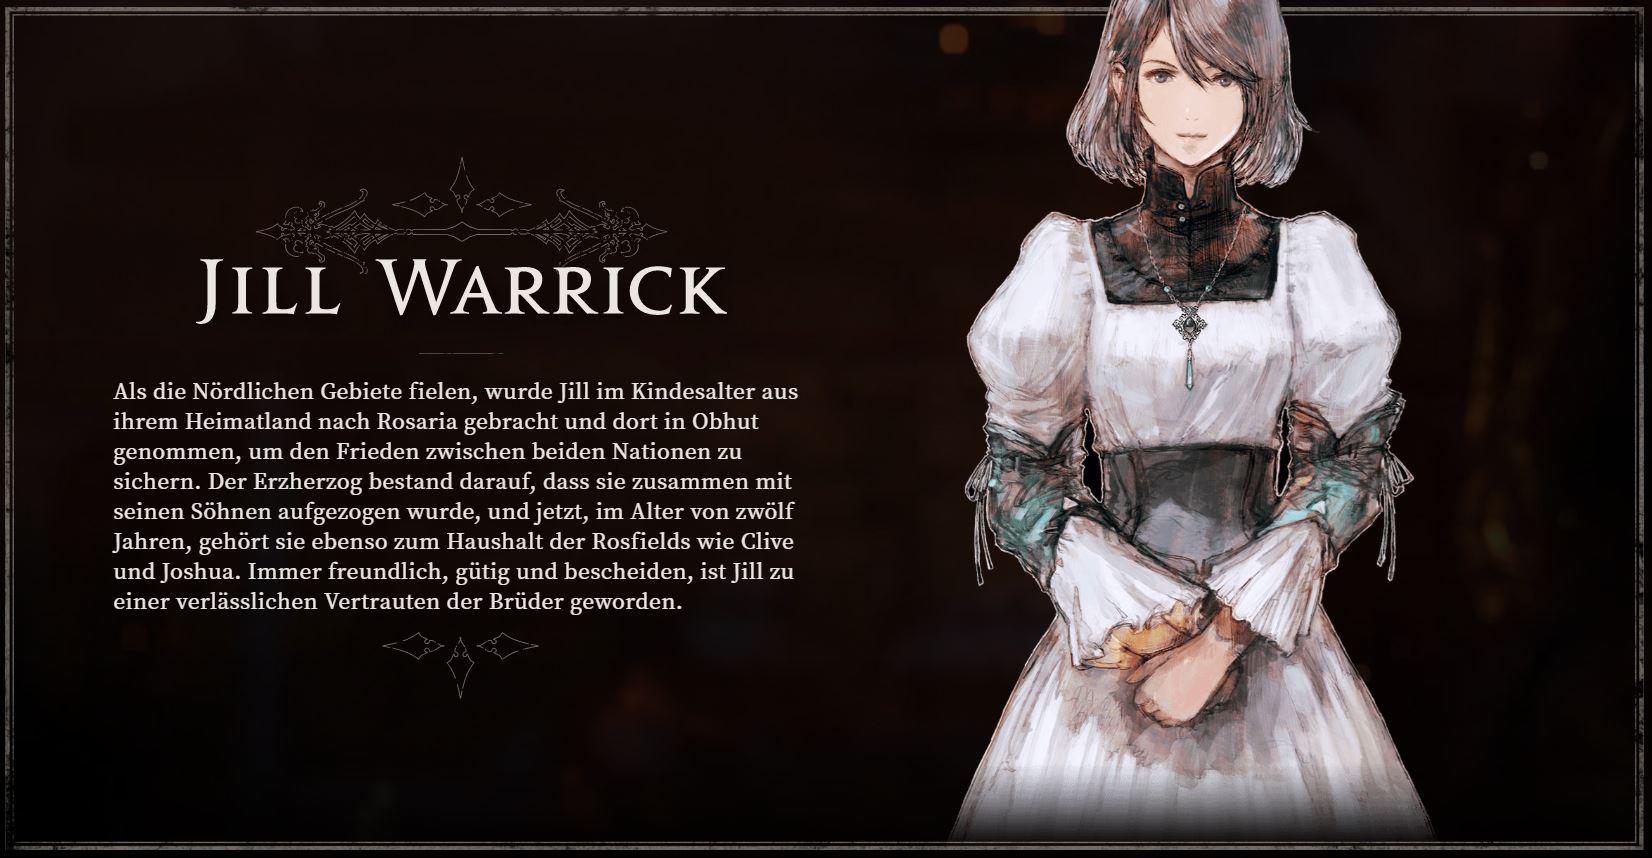 Jill Warrick